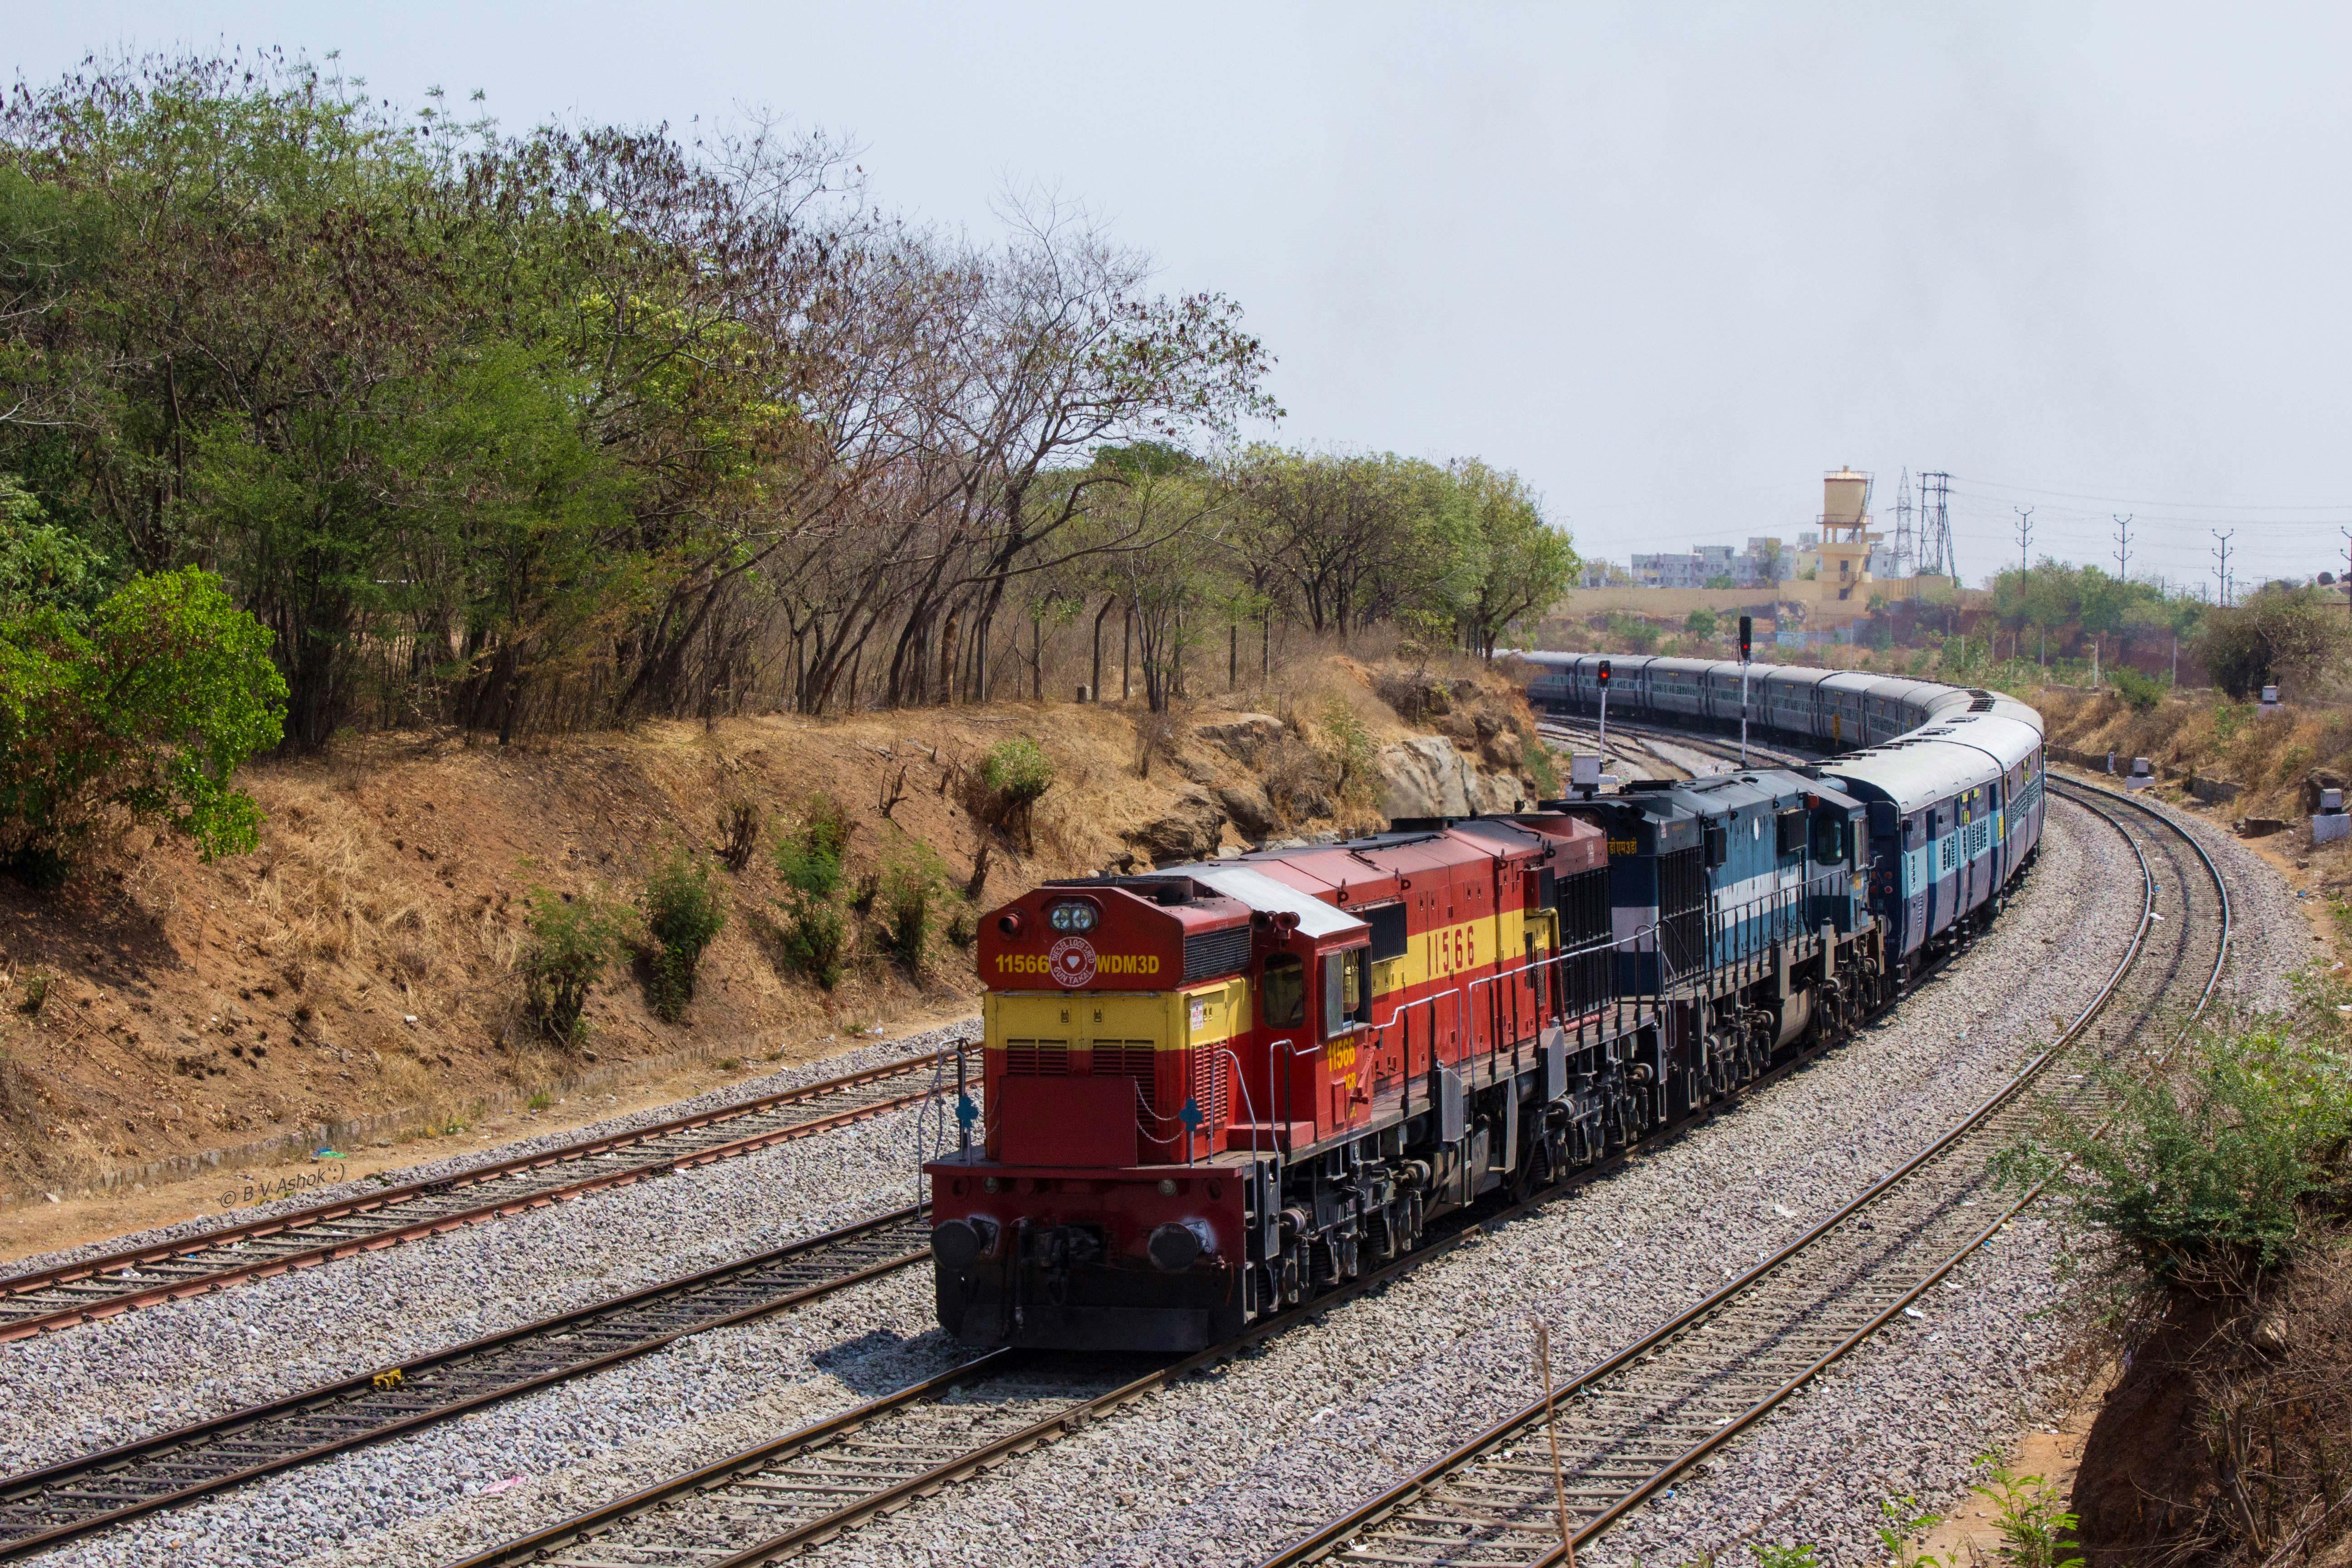 Image Credits: Belur Ashok Via Flickr.com